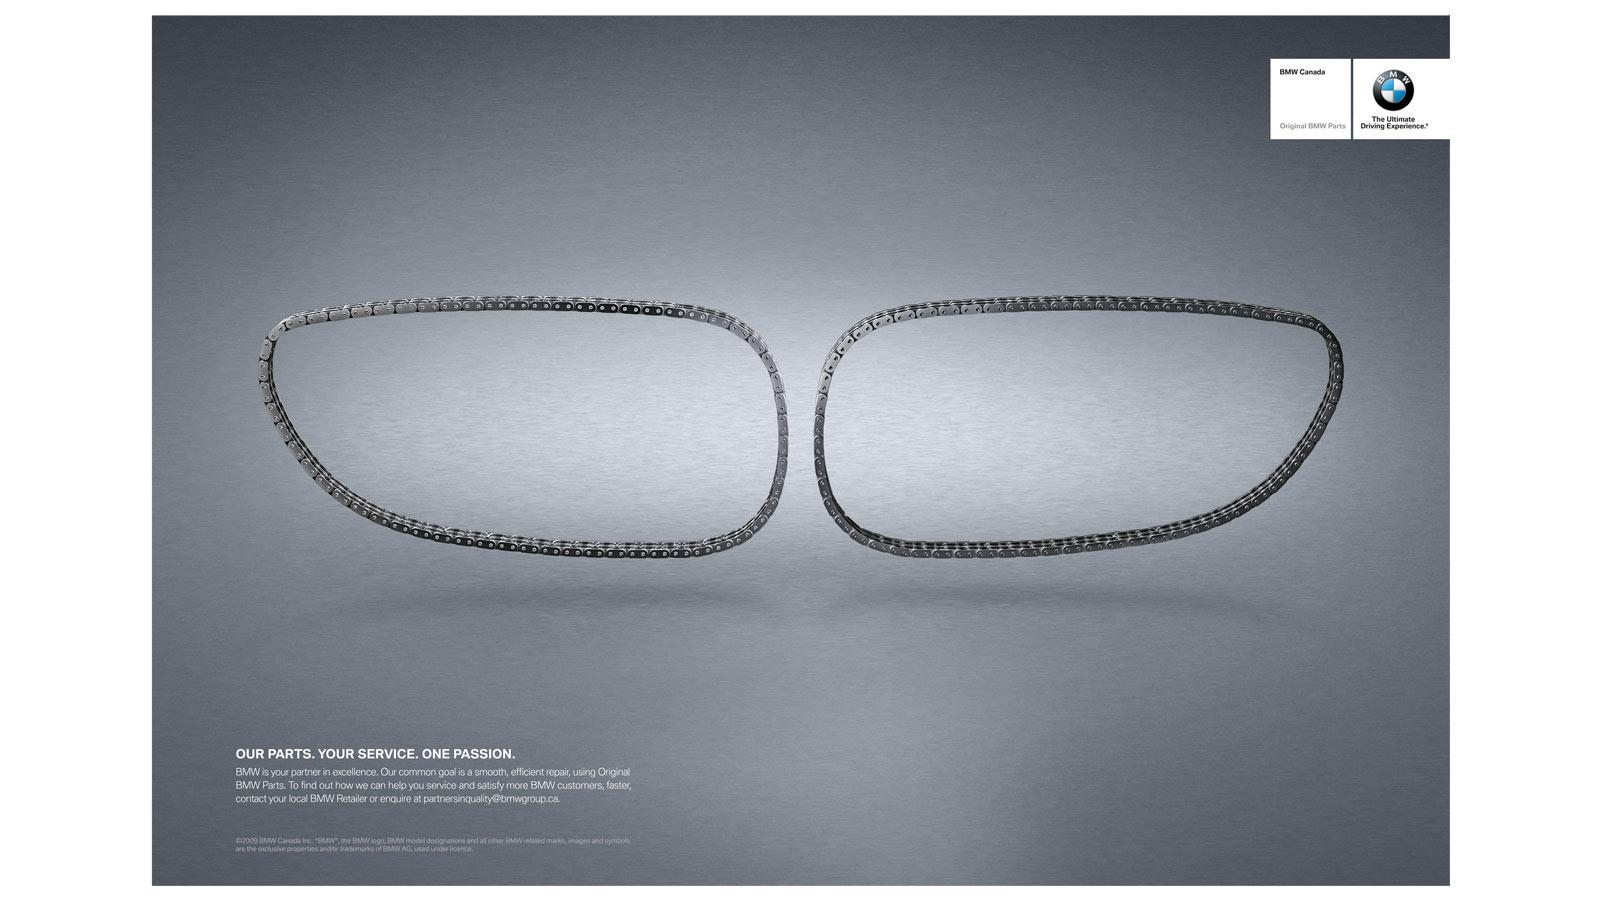 BMW Canada | Campagne imprimée grilles | Automobile, Design, Imprimé